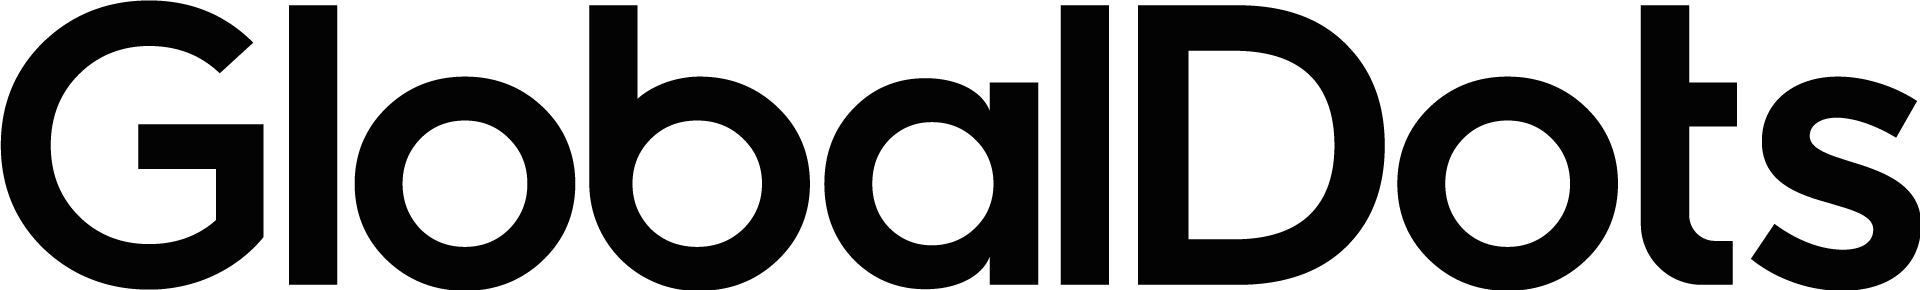 logo_transparent_black_1920x290